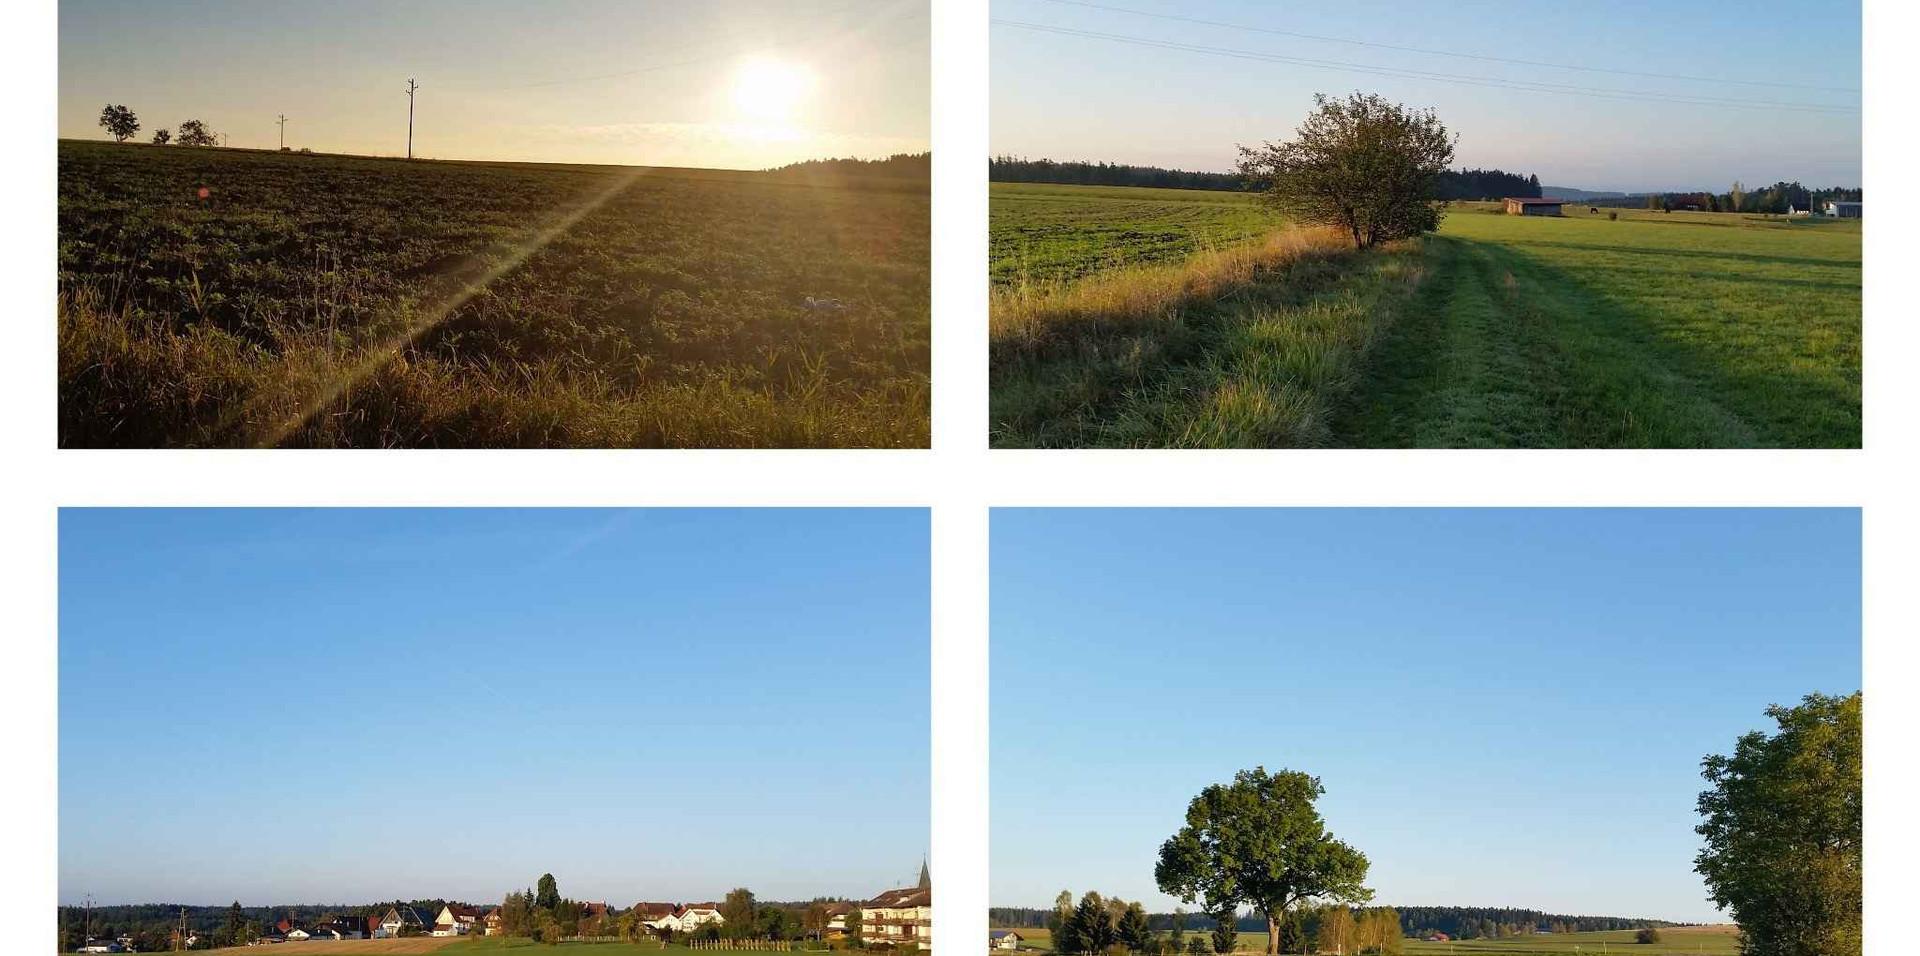 2015-09-21 KBS Schwarzwald PicsArt.jpg